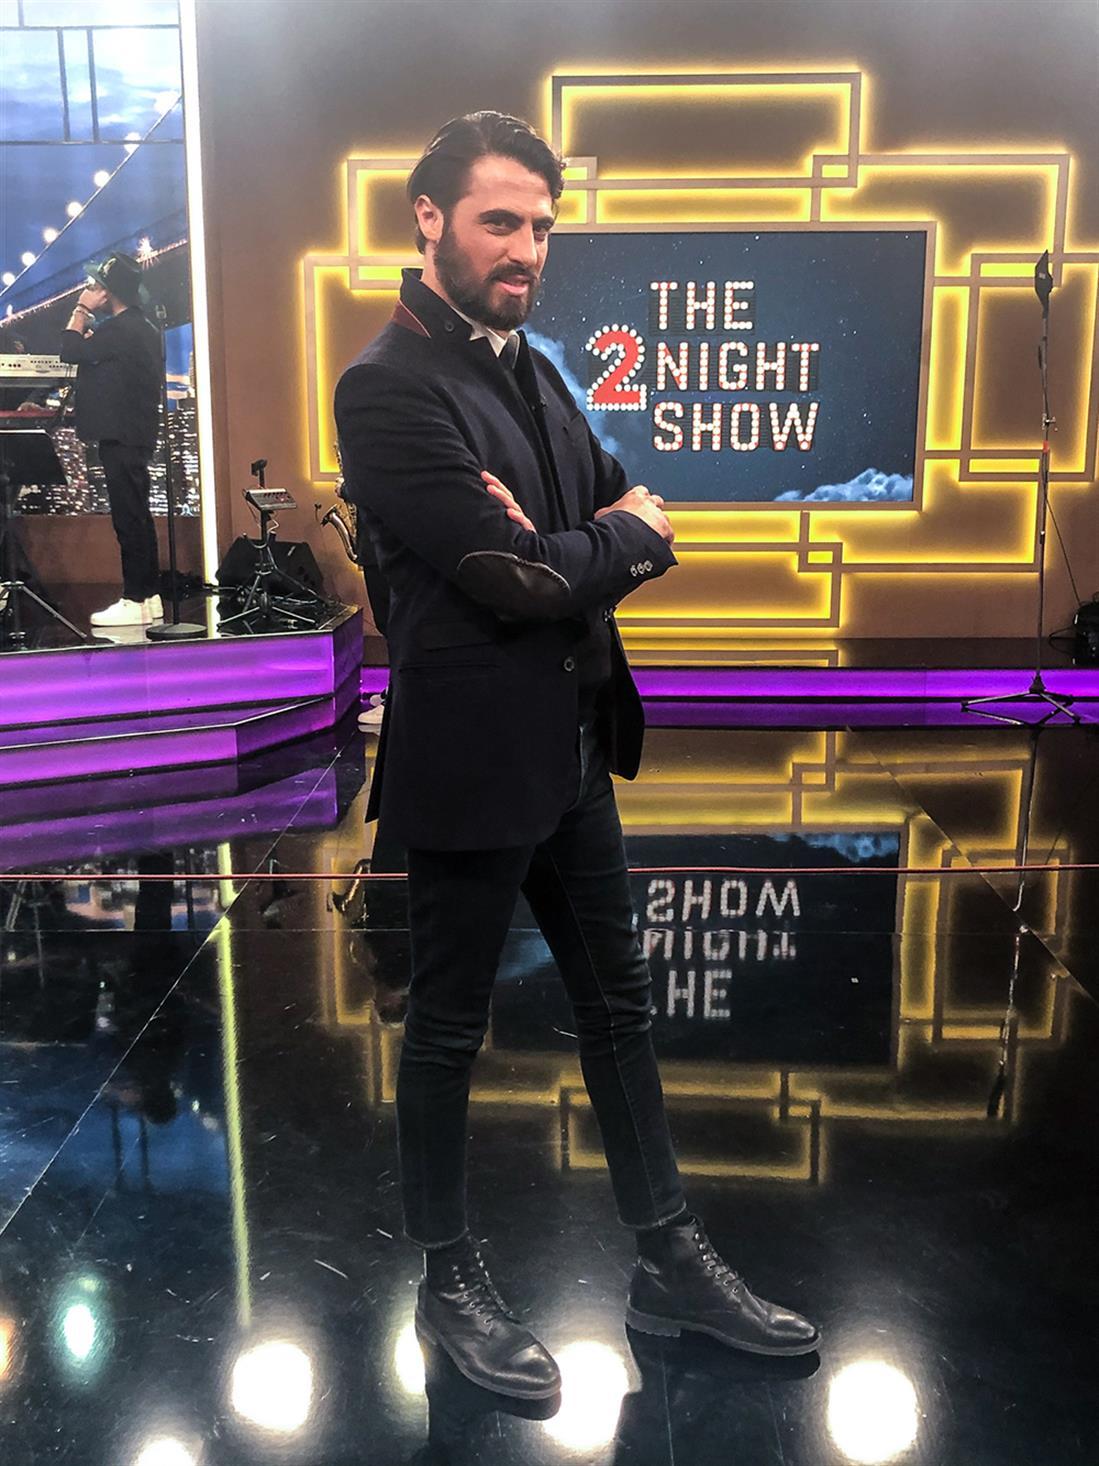 The 2Night Show - Γρηγόρης Αρναούτογλου - Σταύρος Ιωάννης Γκολέμας